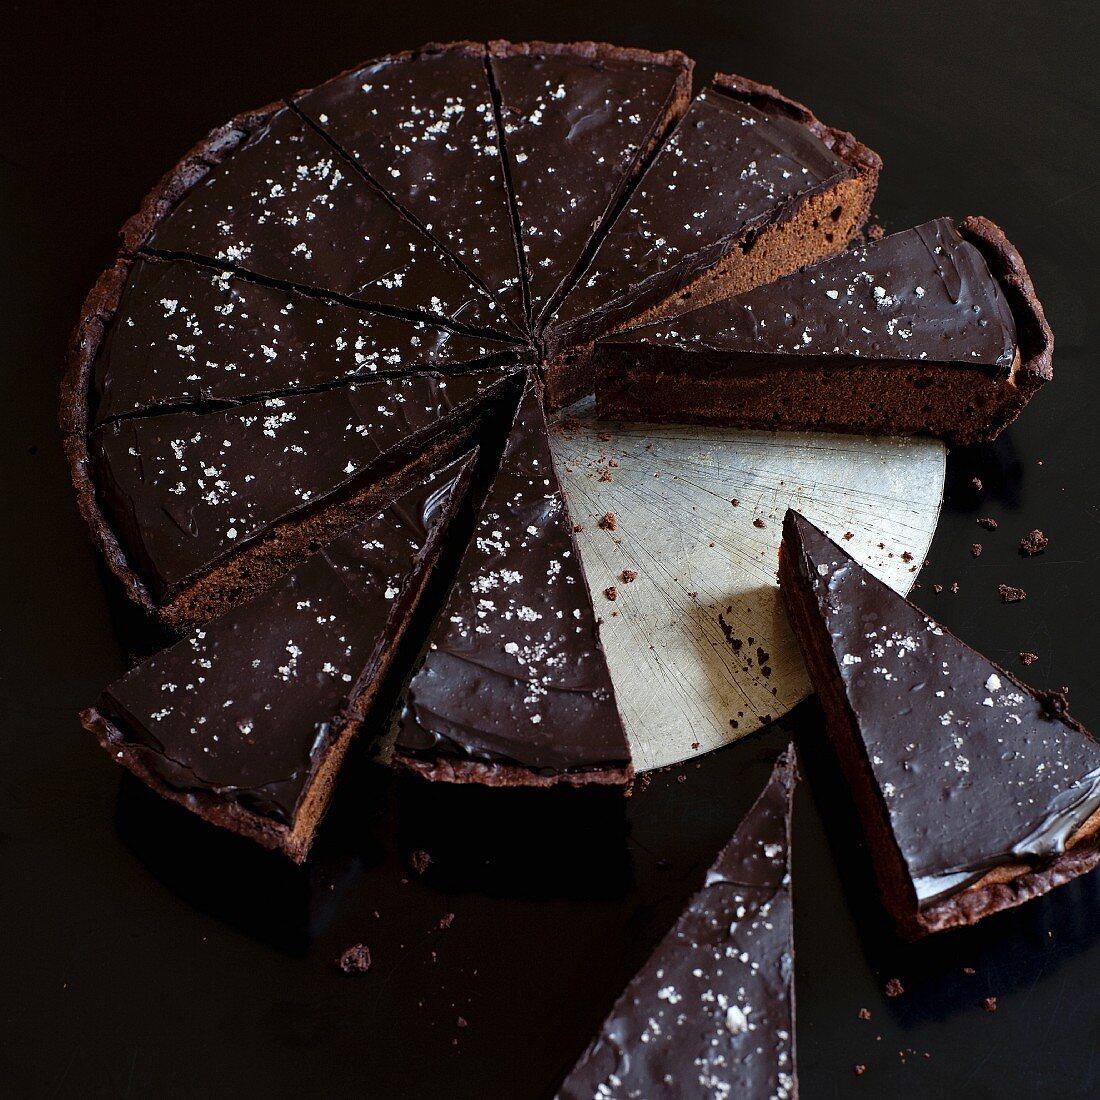 Mississippi mud pie (chocolate pie, USA)